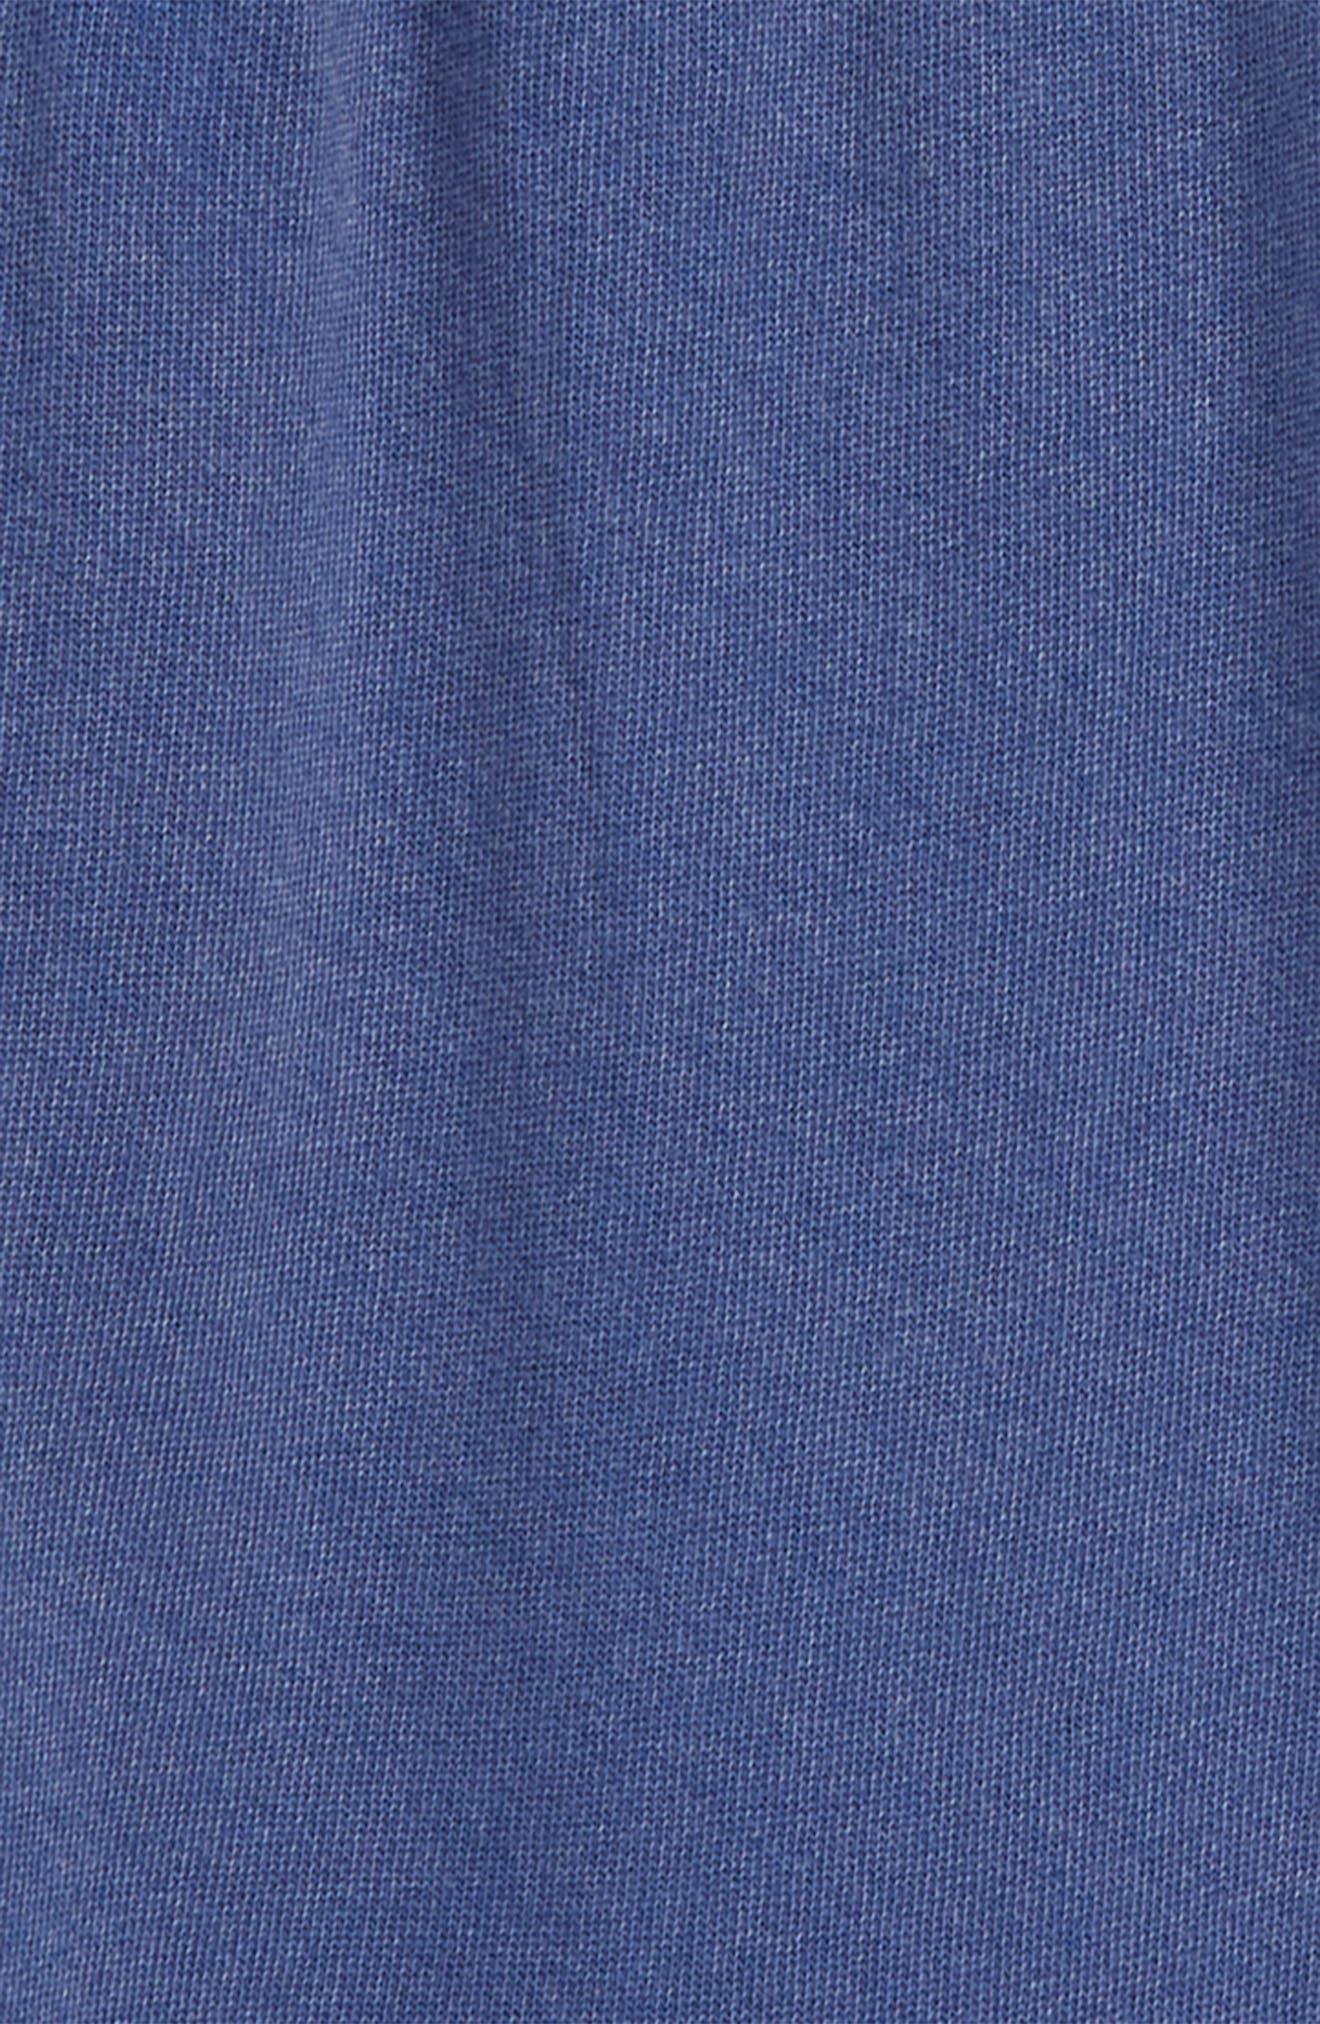 Knit Shorts,                             Alternate thumbnail 2, color,                             Blue Sodalite Wash